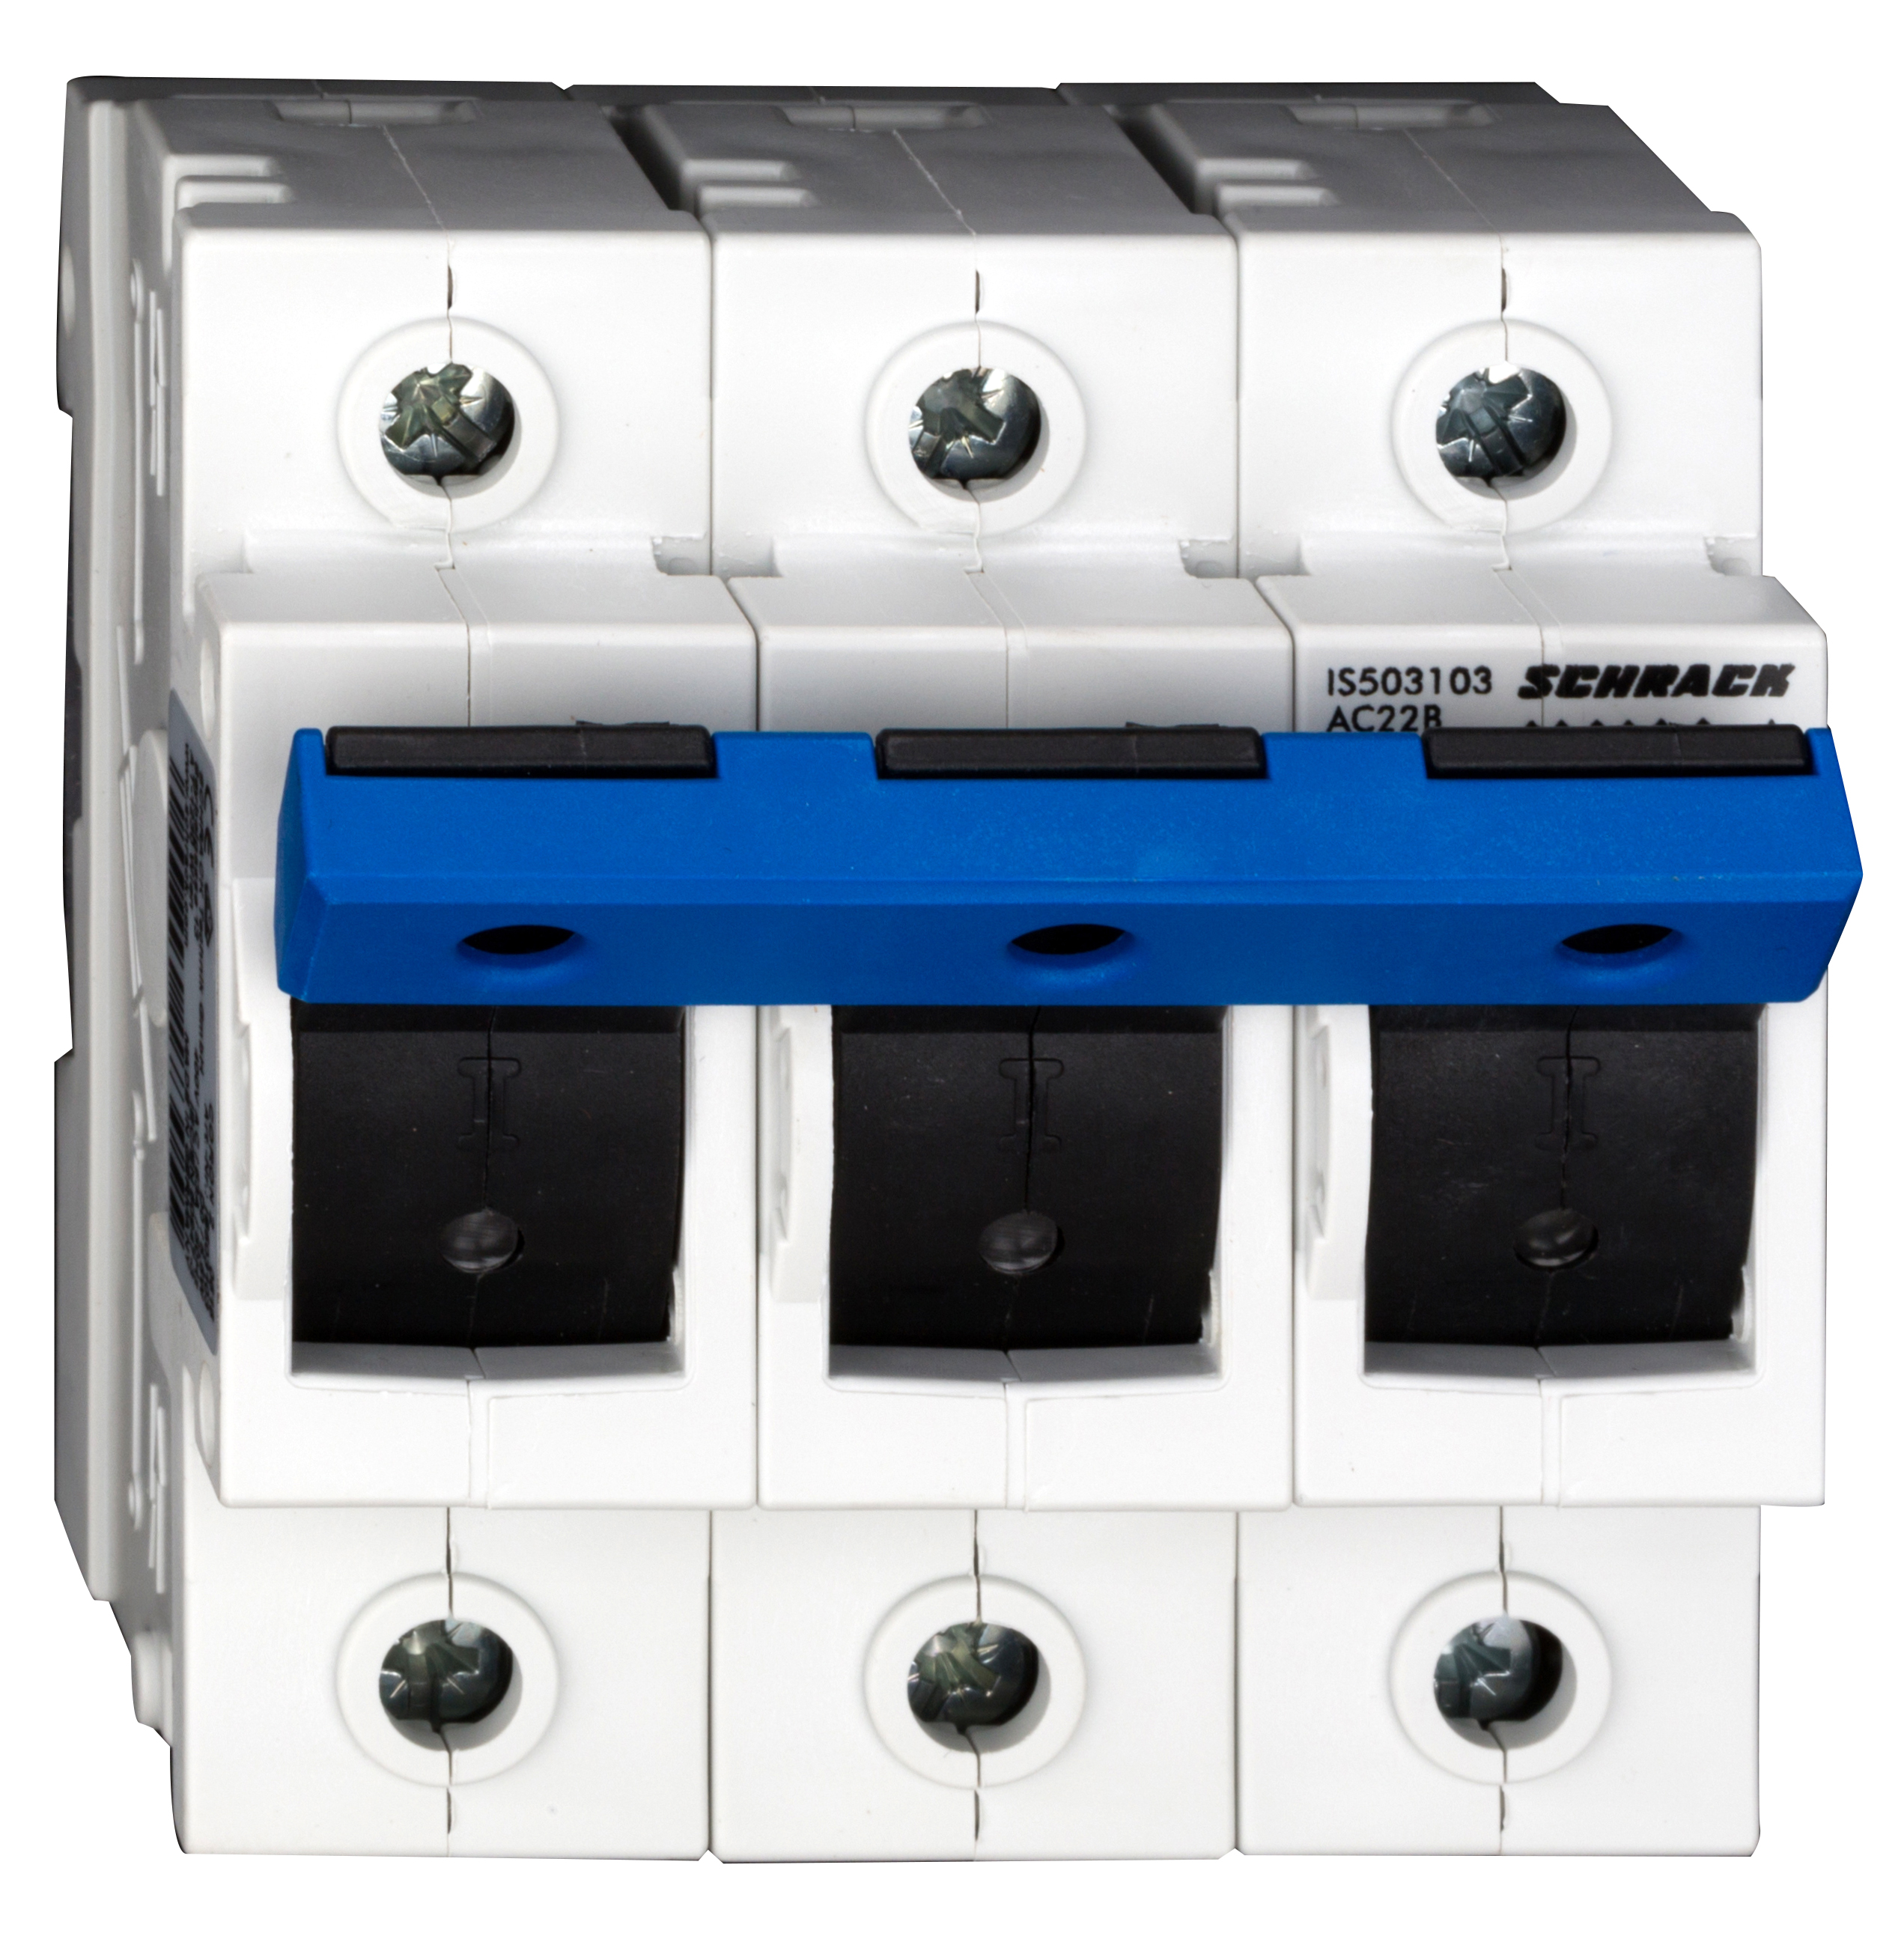 1 Stk CORON 2, D02-Sicherungslasttrennschalter, 63A, 3-polig IS503103--